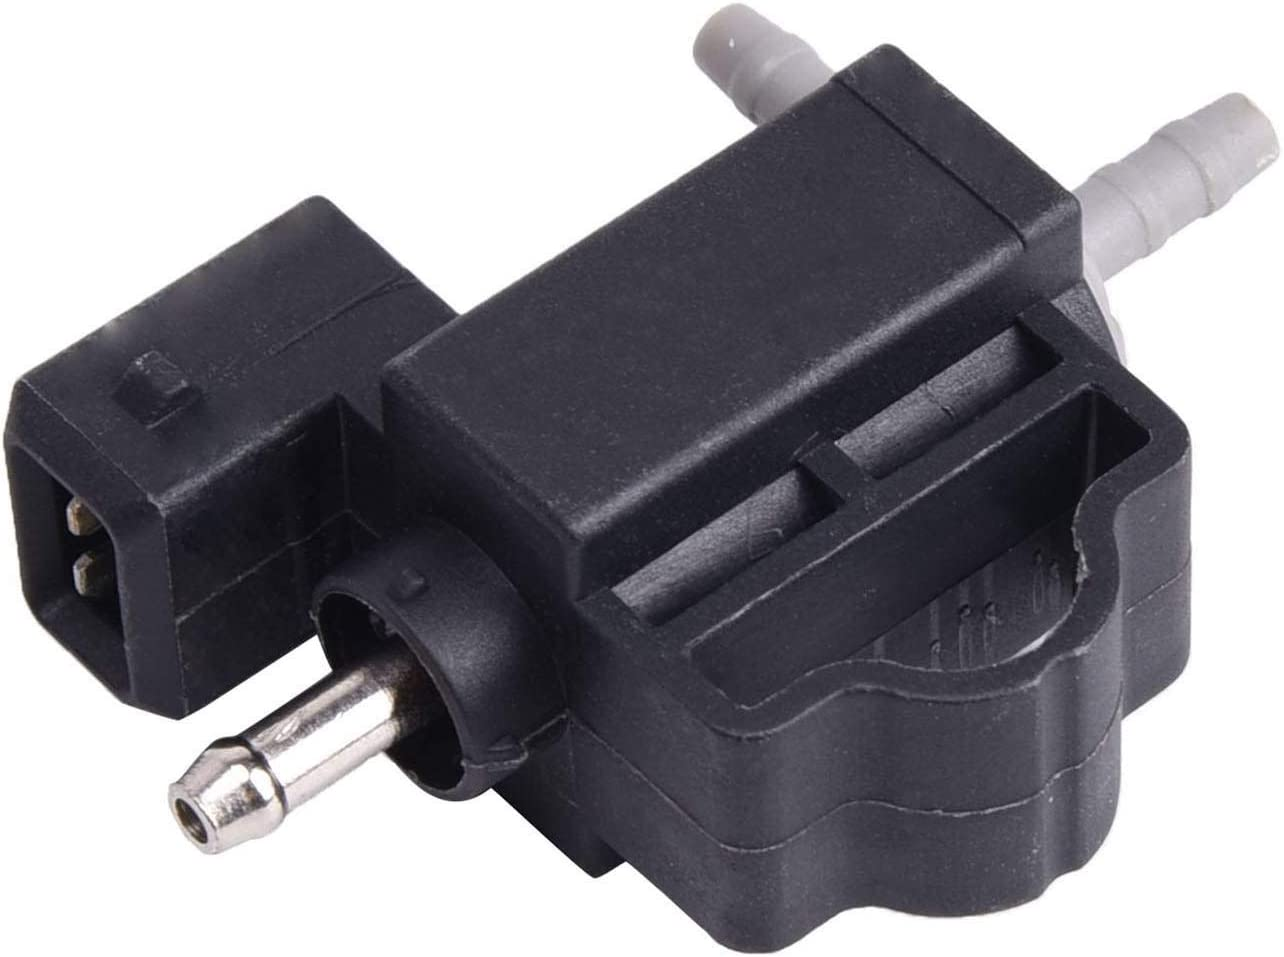 Veizn Turbocharger Intercooler Bypass 67% OFF of fixed price Oakland Mall Valve Forvolv-O Solenoid B